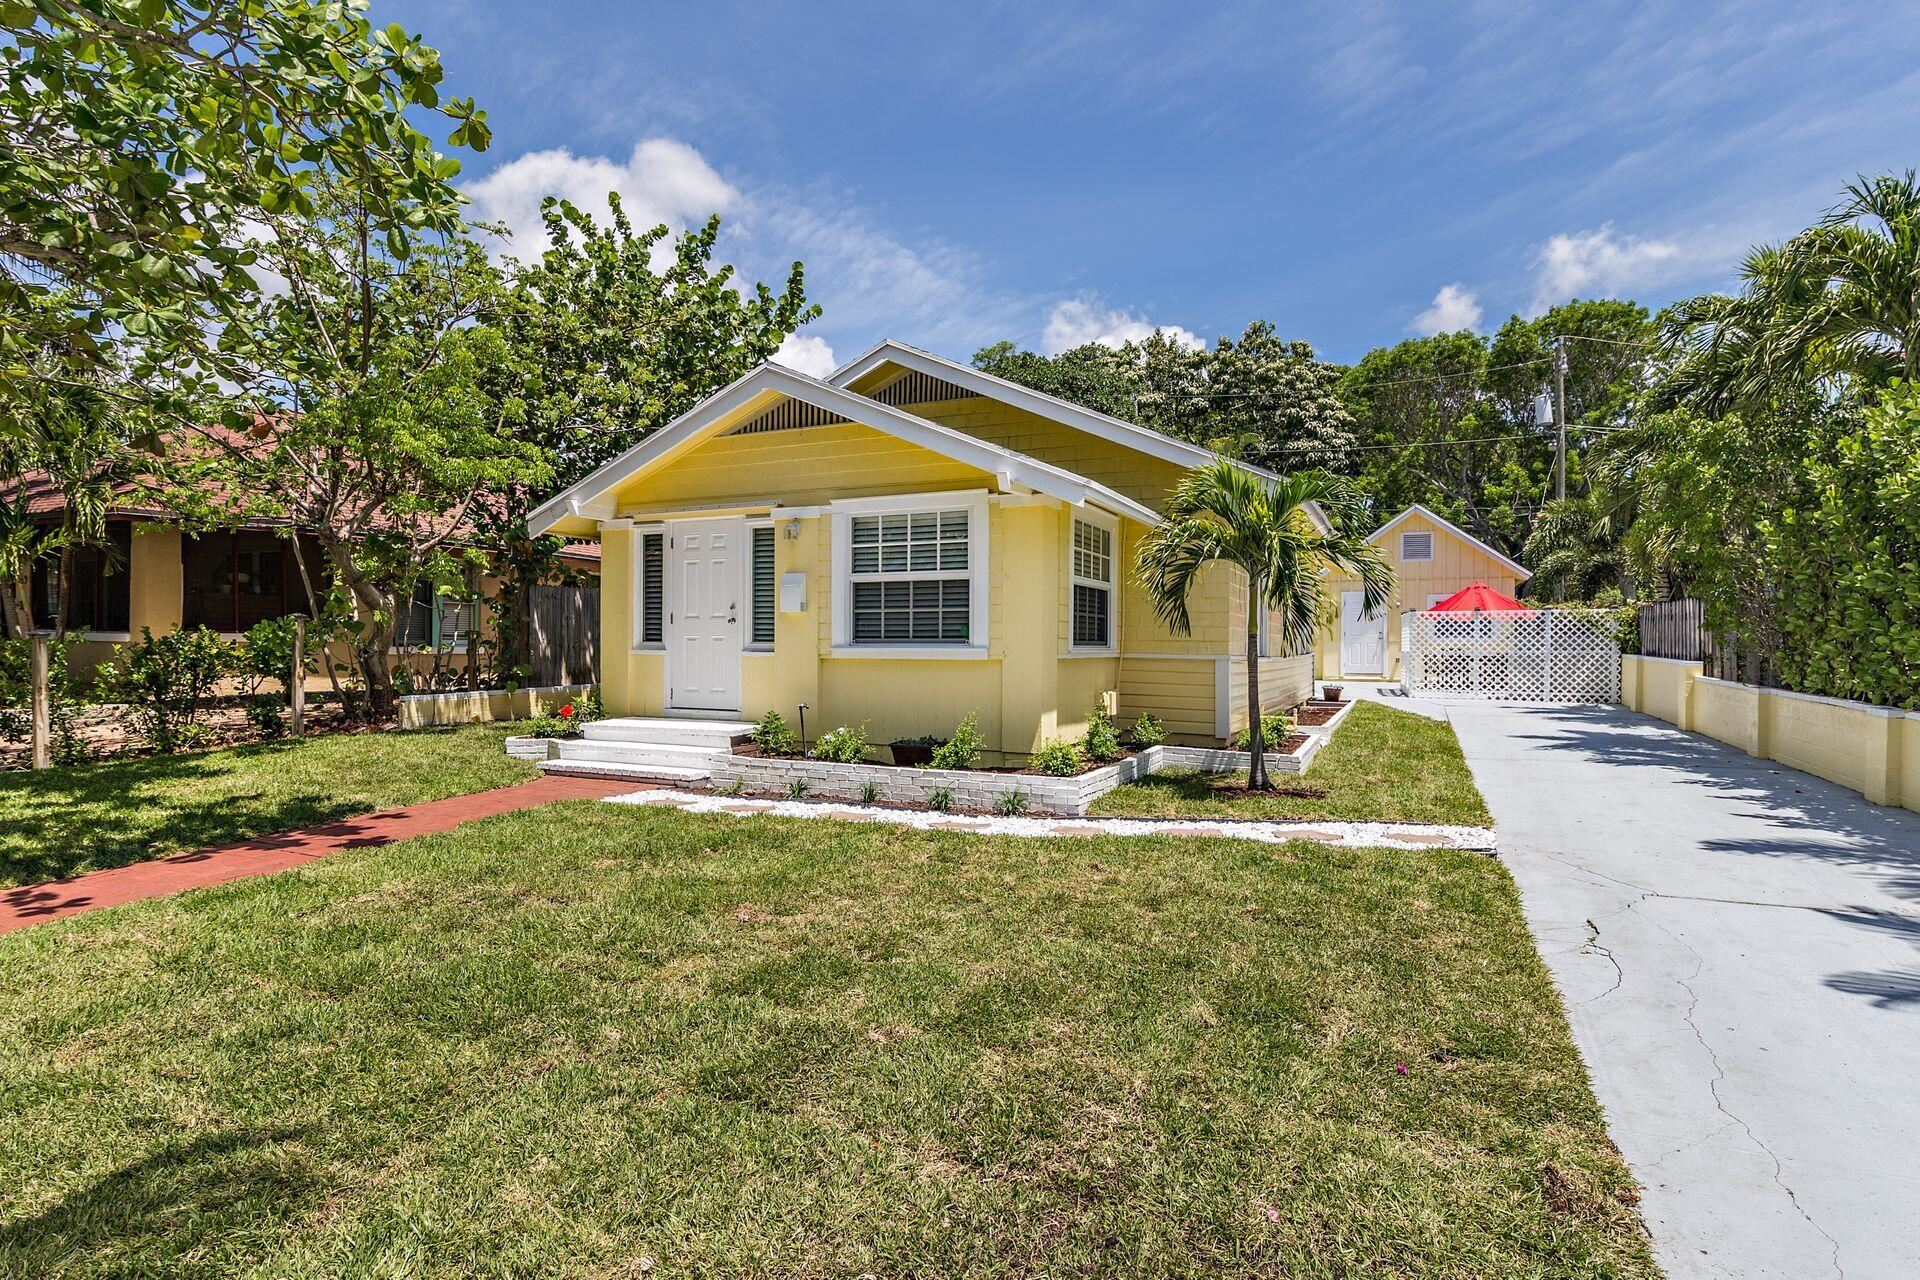 717 New Jersey Street, West Palm Beach, FL 33401 - MLS#: RX-10718566